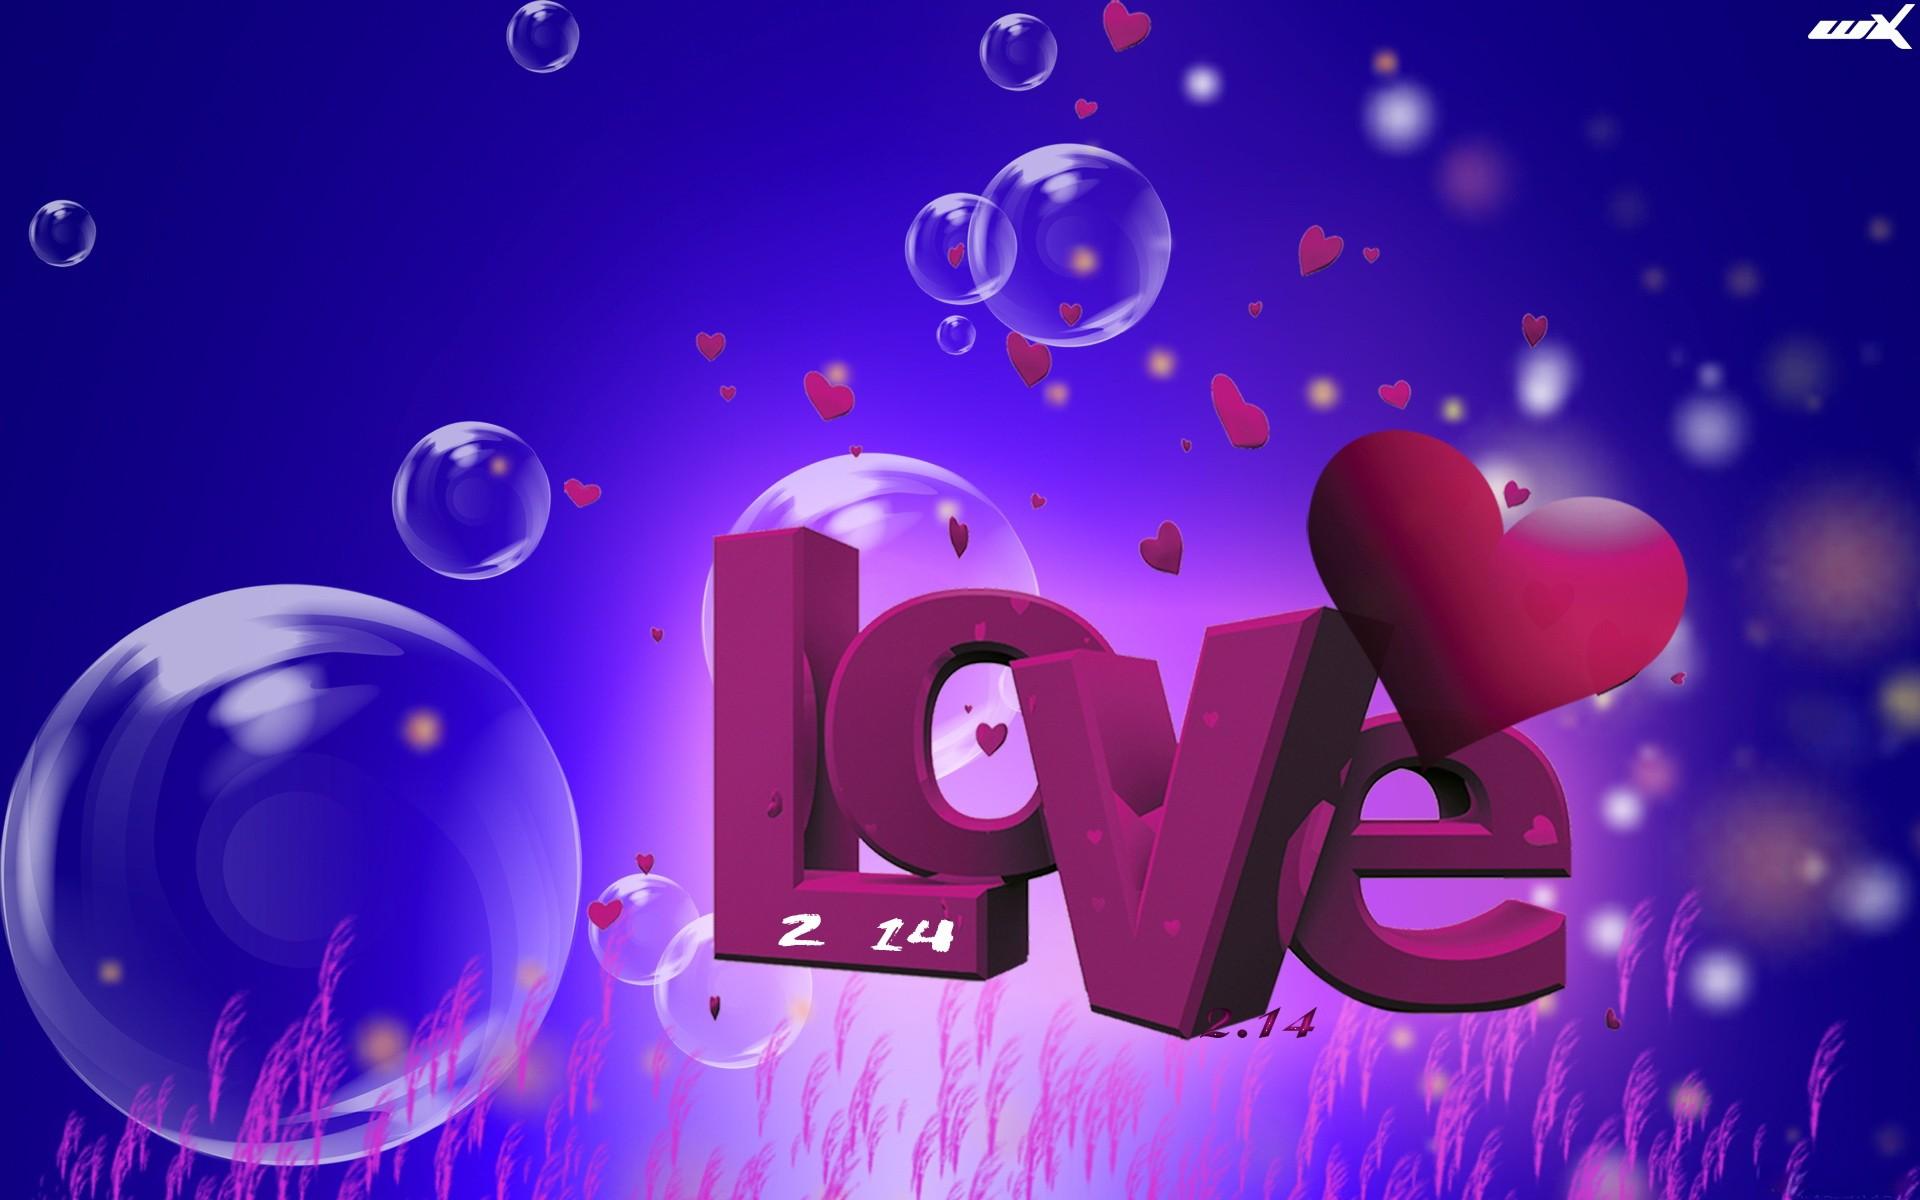 Love Hearts Wallpaper 1920x1200 Love Hearts 1920x1200